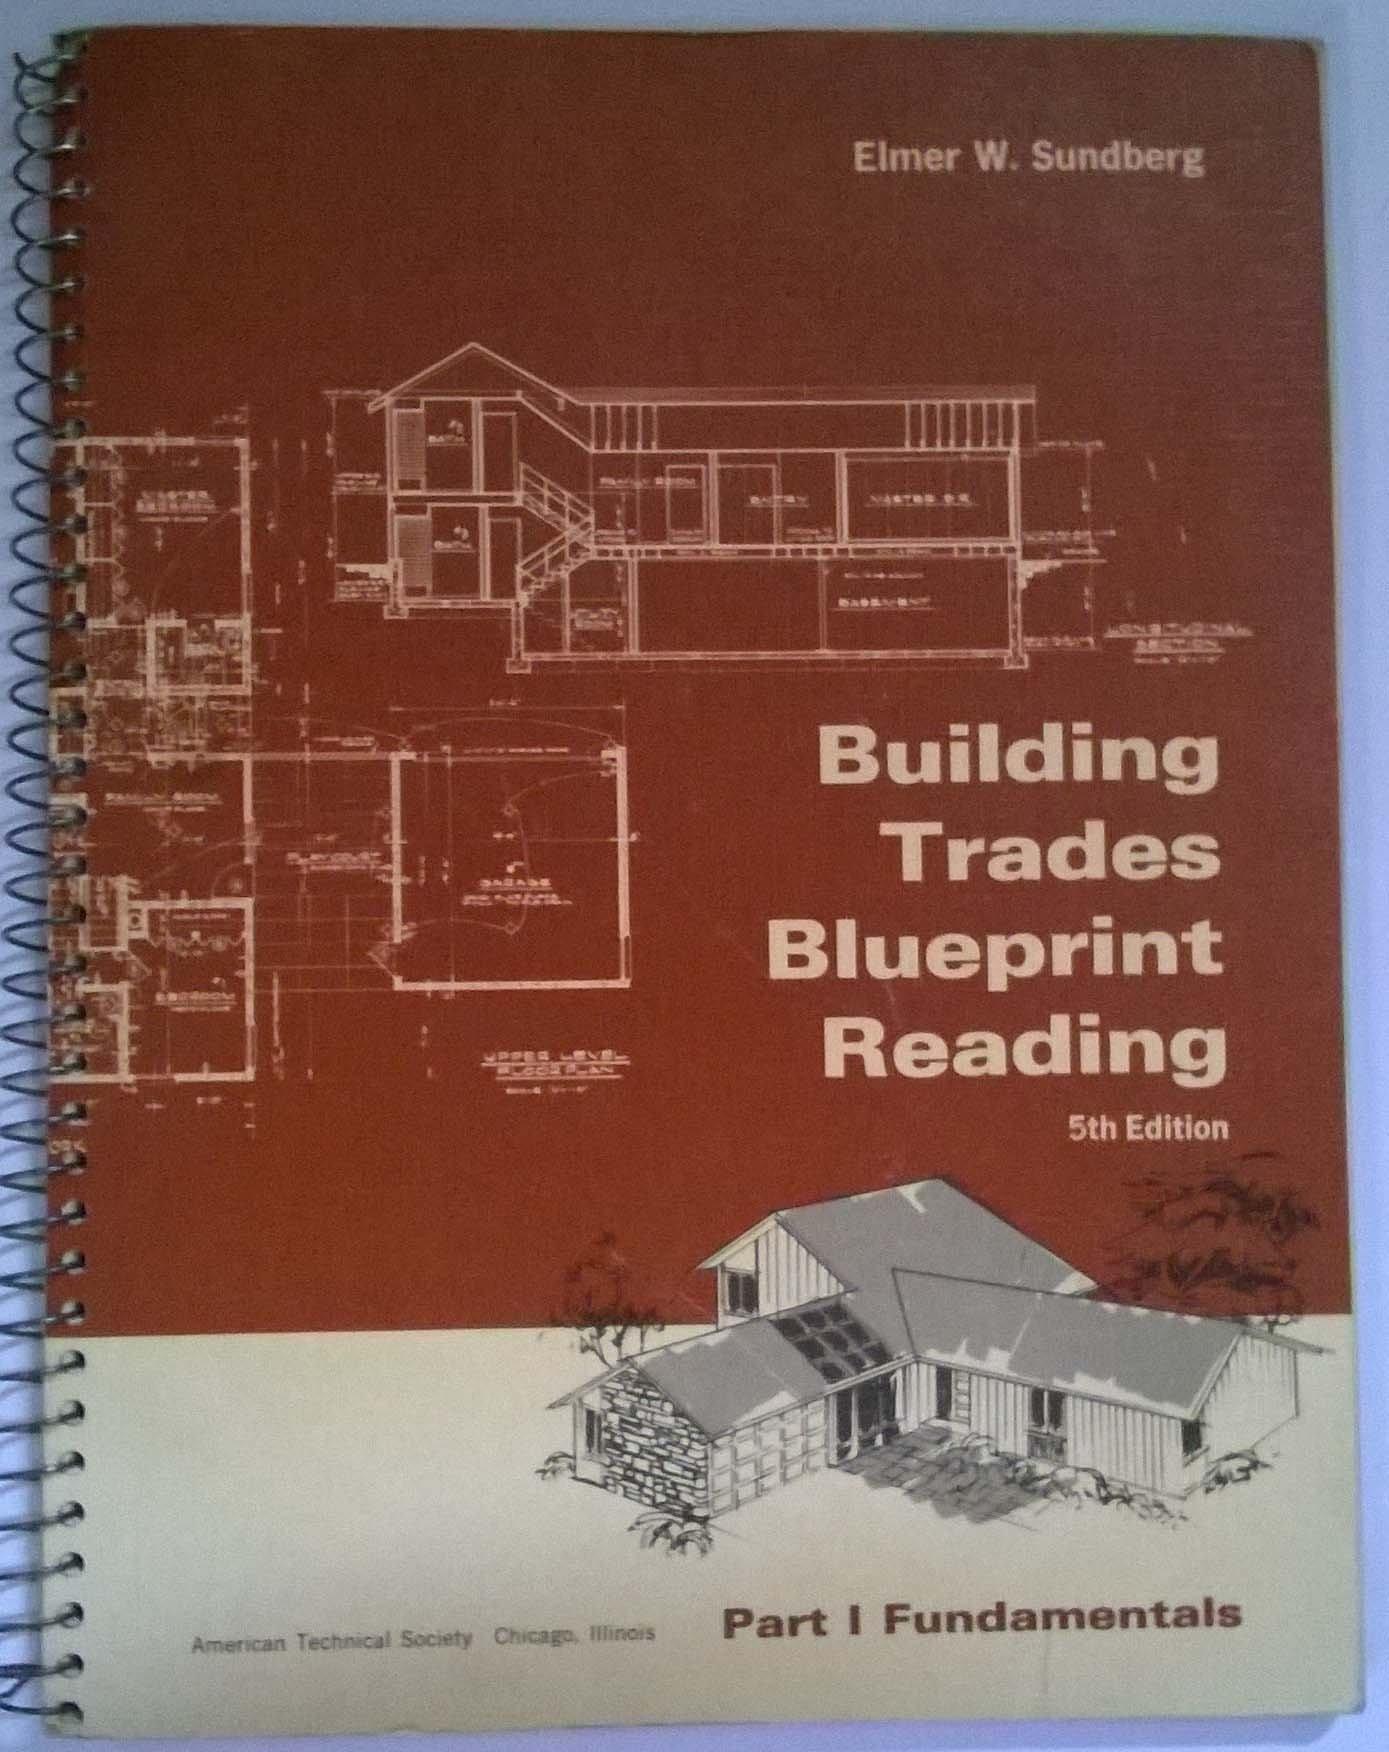 Building trades blueprint reading fifth edition part i building trades blueprint reading fifth edition part i fundamentals elmer w sundberg amazon books malvernweather Images